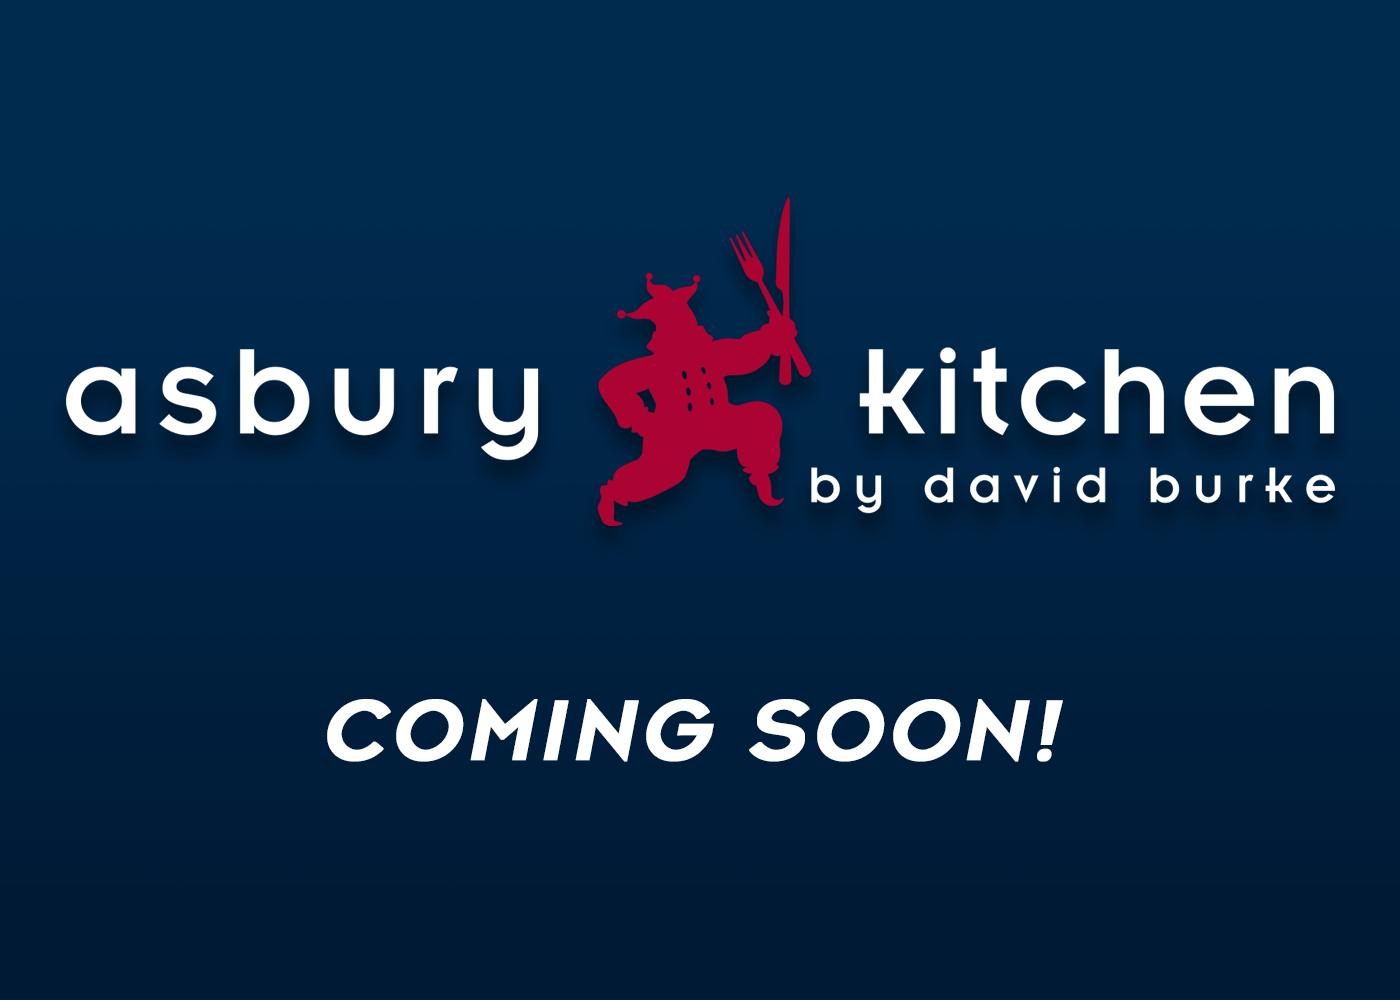 Asbury Kitchen Coming Soon logo